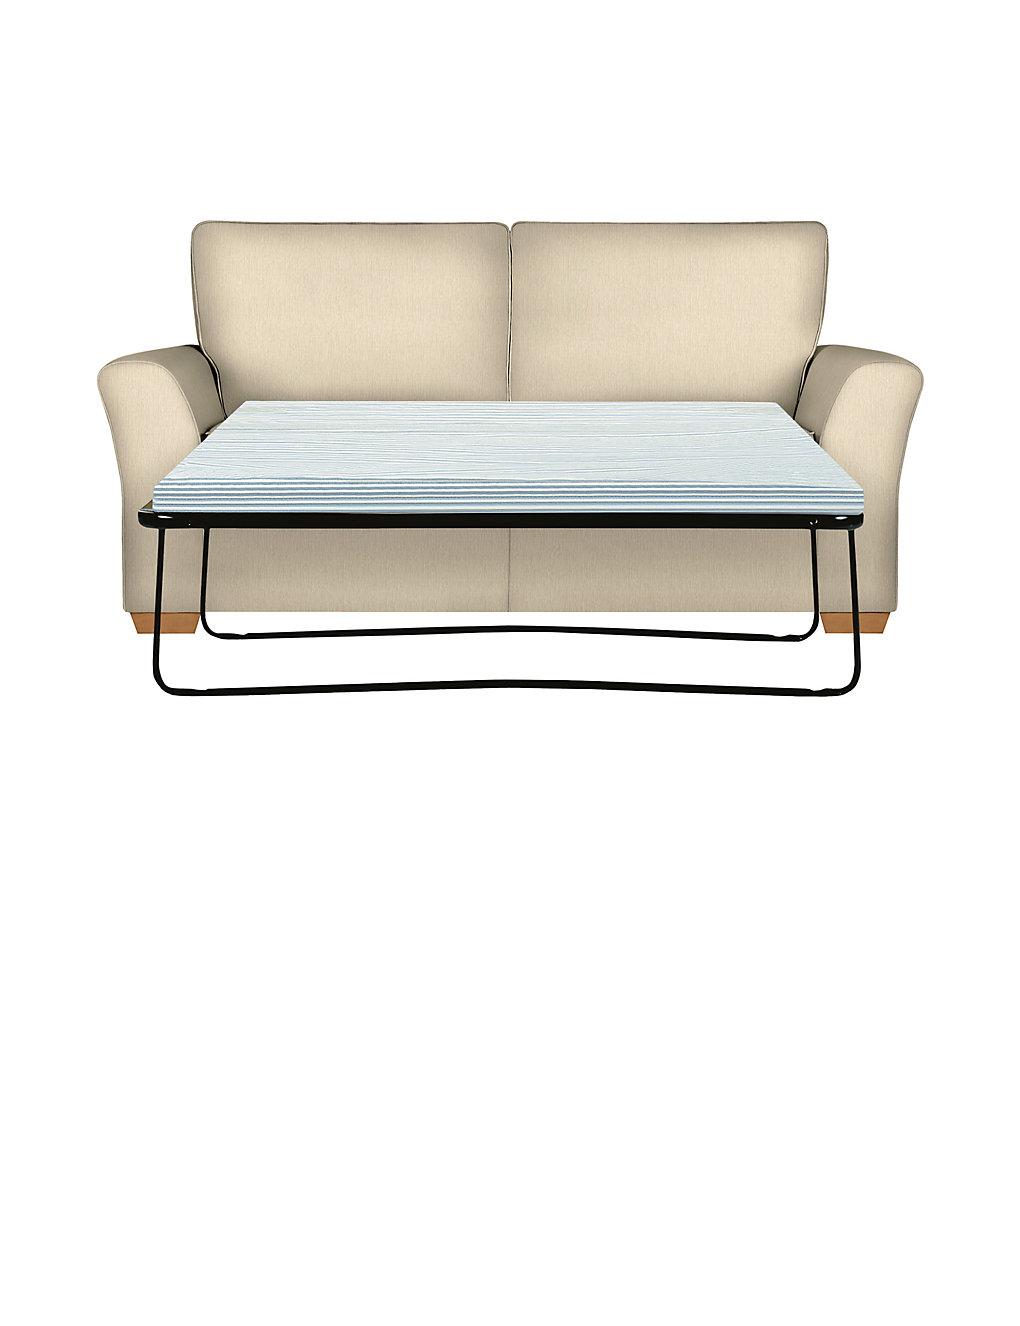 Sofa Beds Marks And Spencer Hereo Sofa